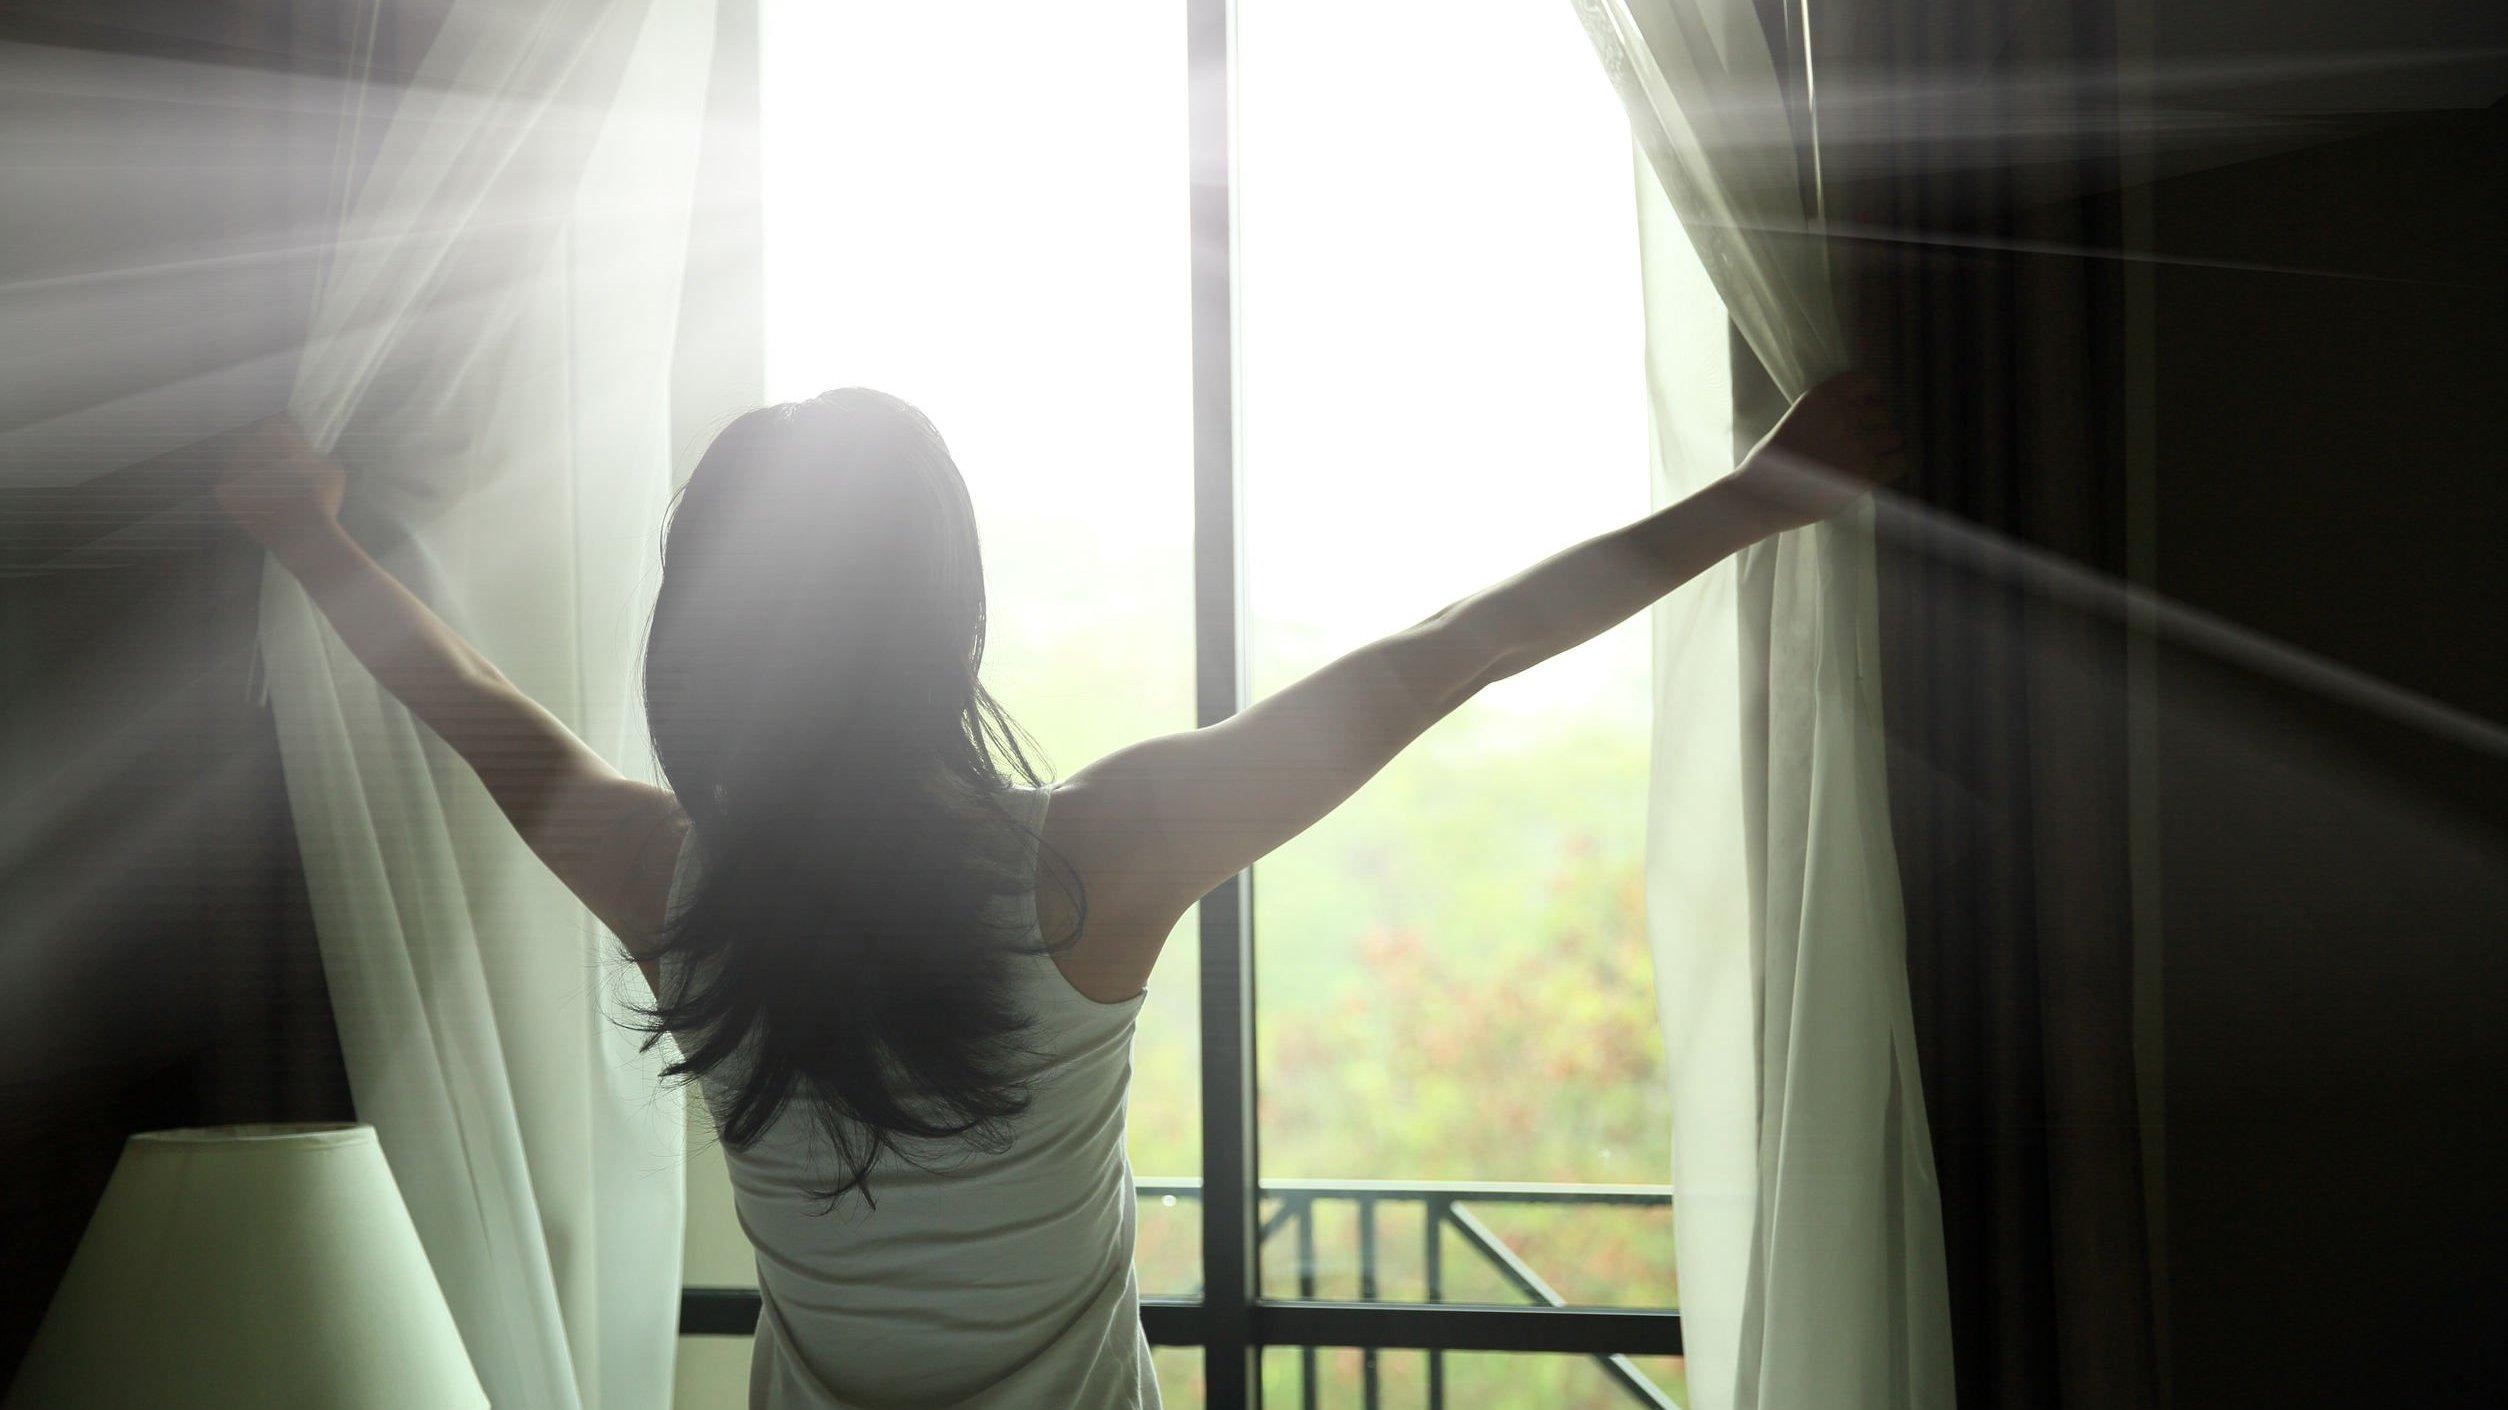 Mulher abrindo cortina